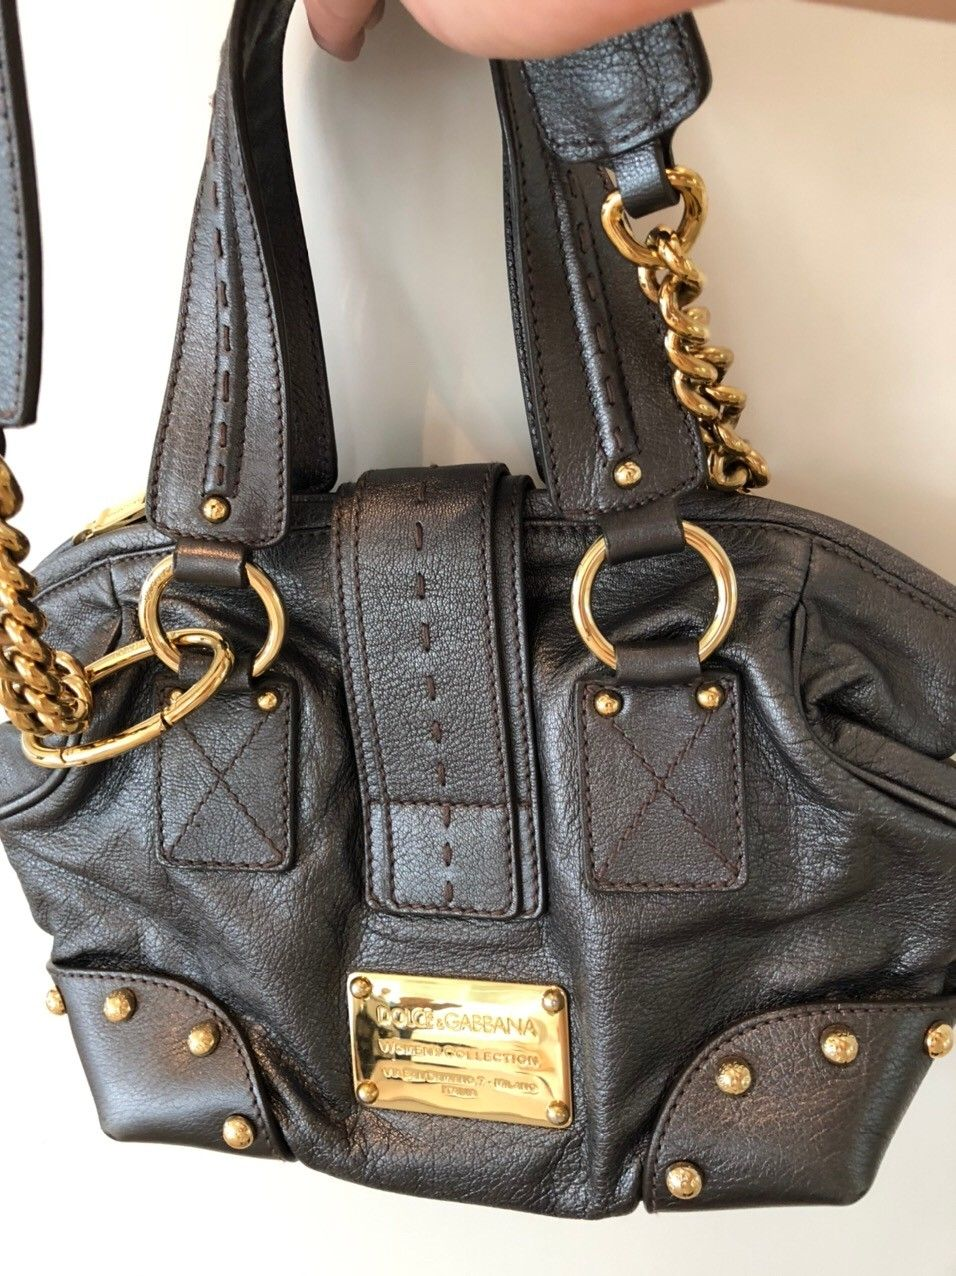 Dolce&Gabbana skinnveske | FINN.no